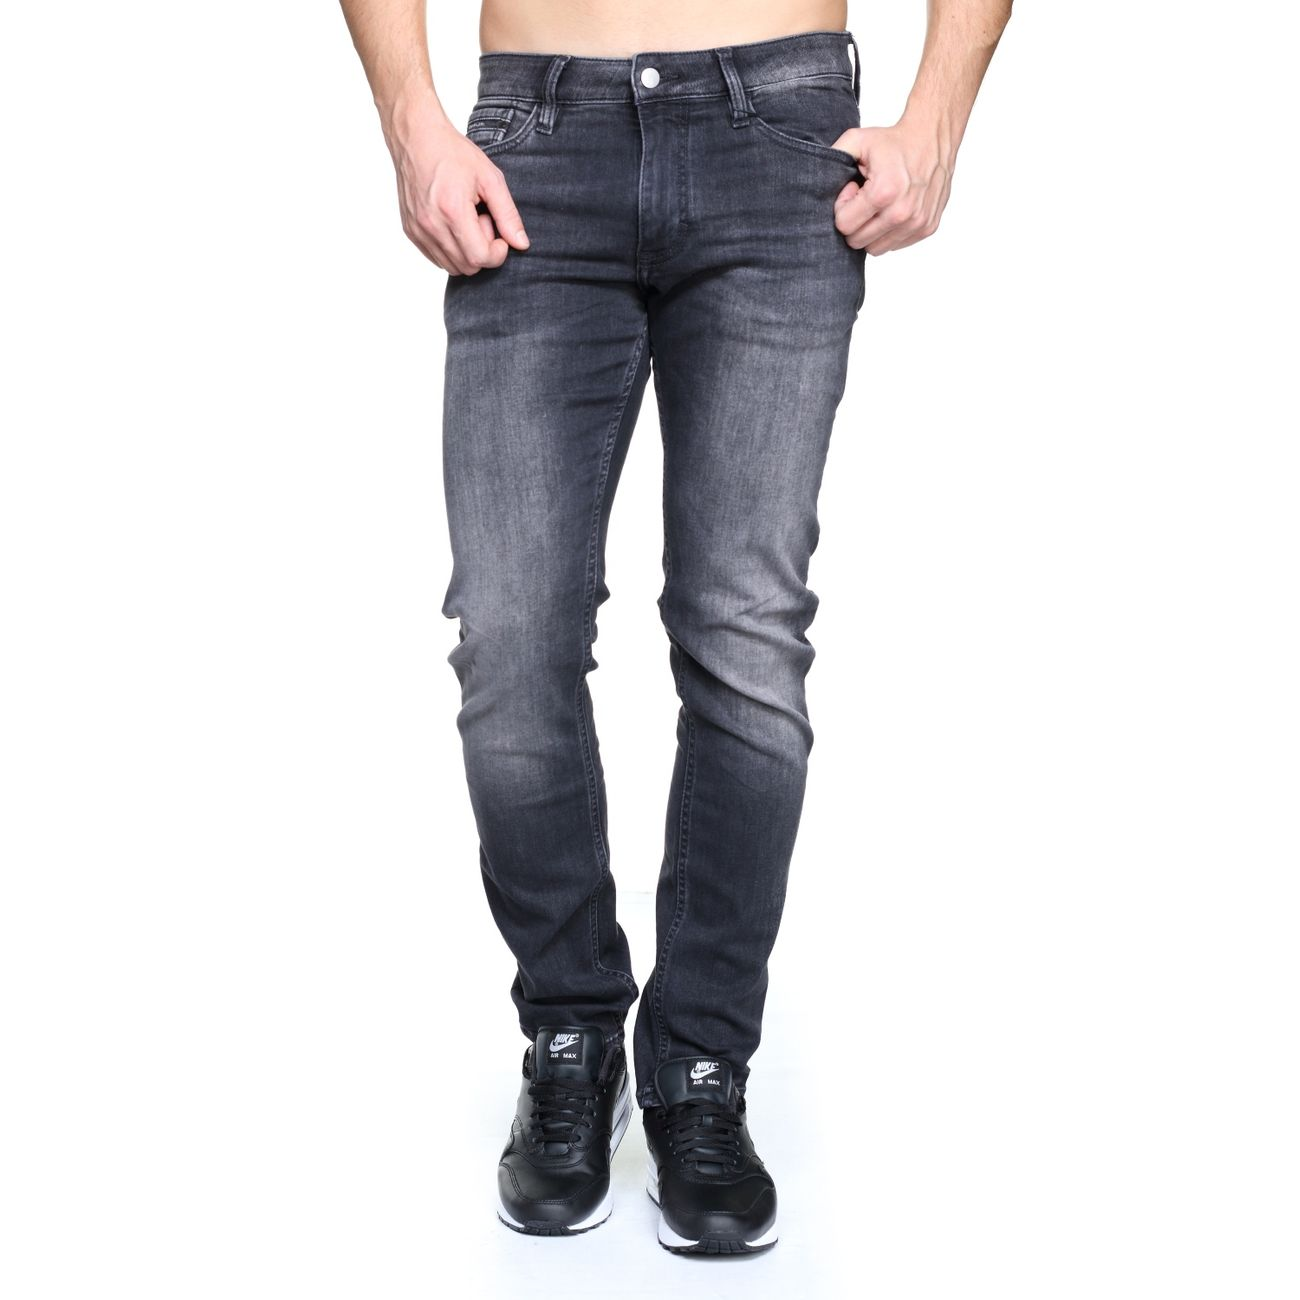 f3779ff5b6482 Mode- Lifestyle homme CALVIN KLEIN Jeans Calvin Klein J30j305256 Slim  Straight 903 Gris ...